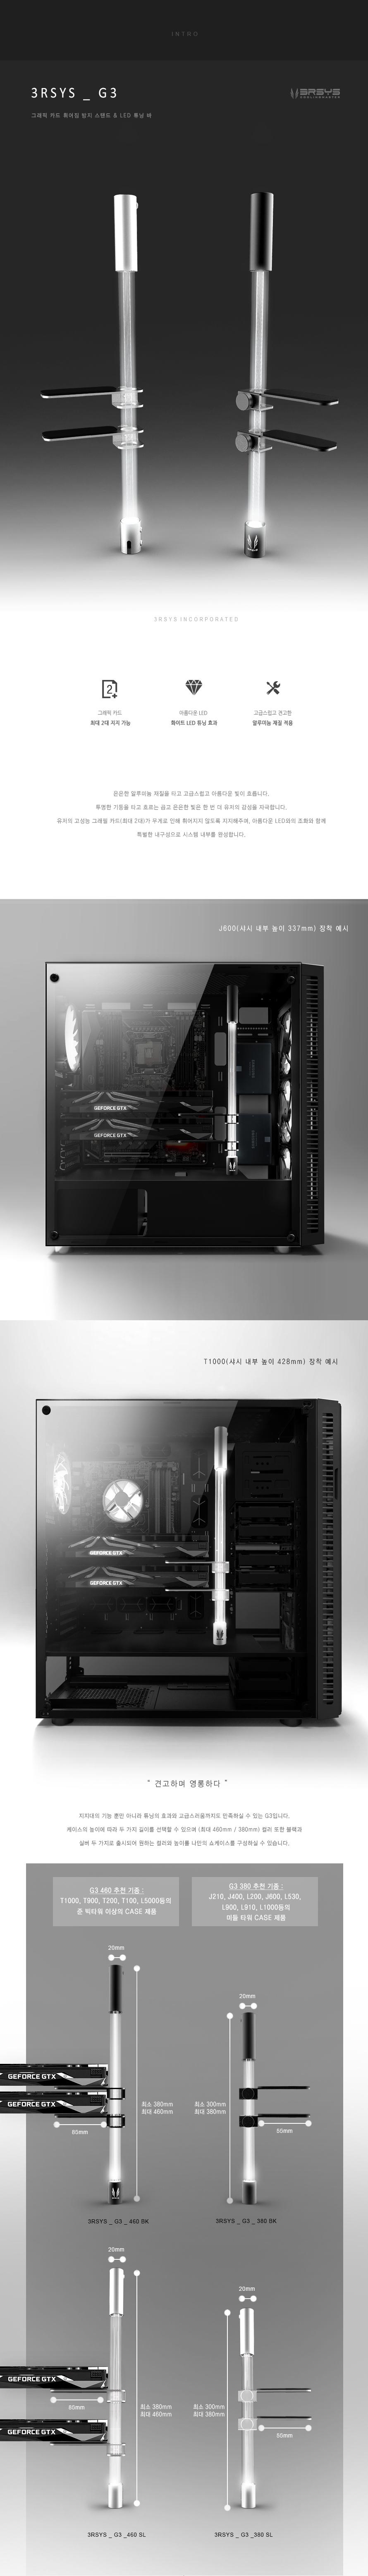 3RSYS  ICEAGE G3 380 그래픽카드 지지대(BLACK)